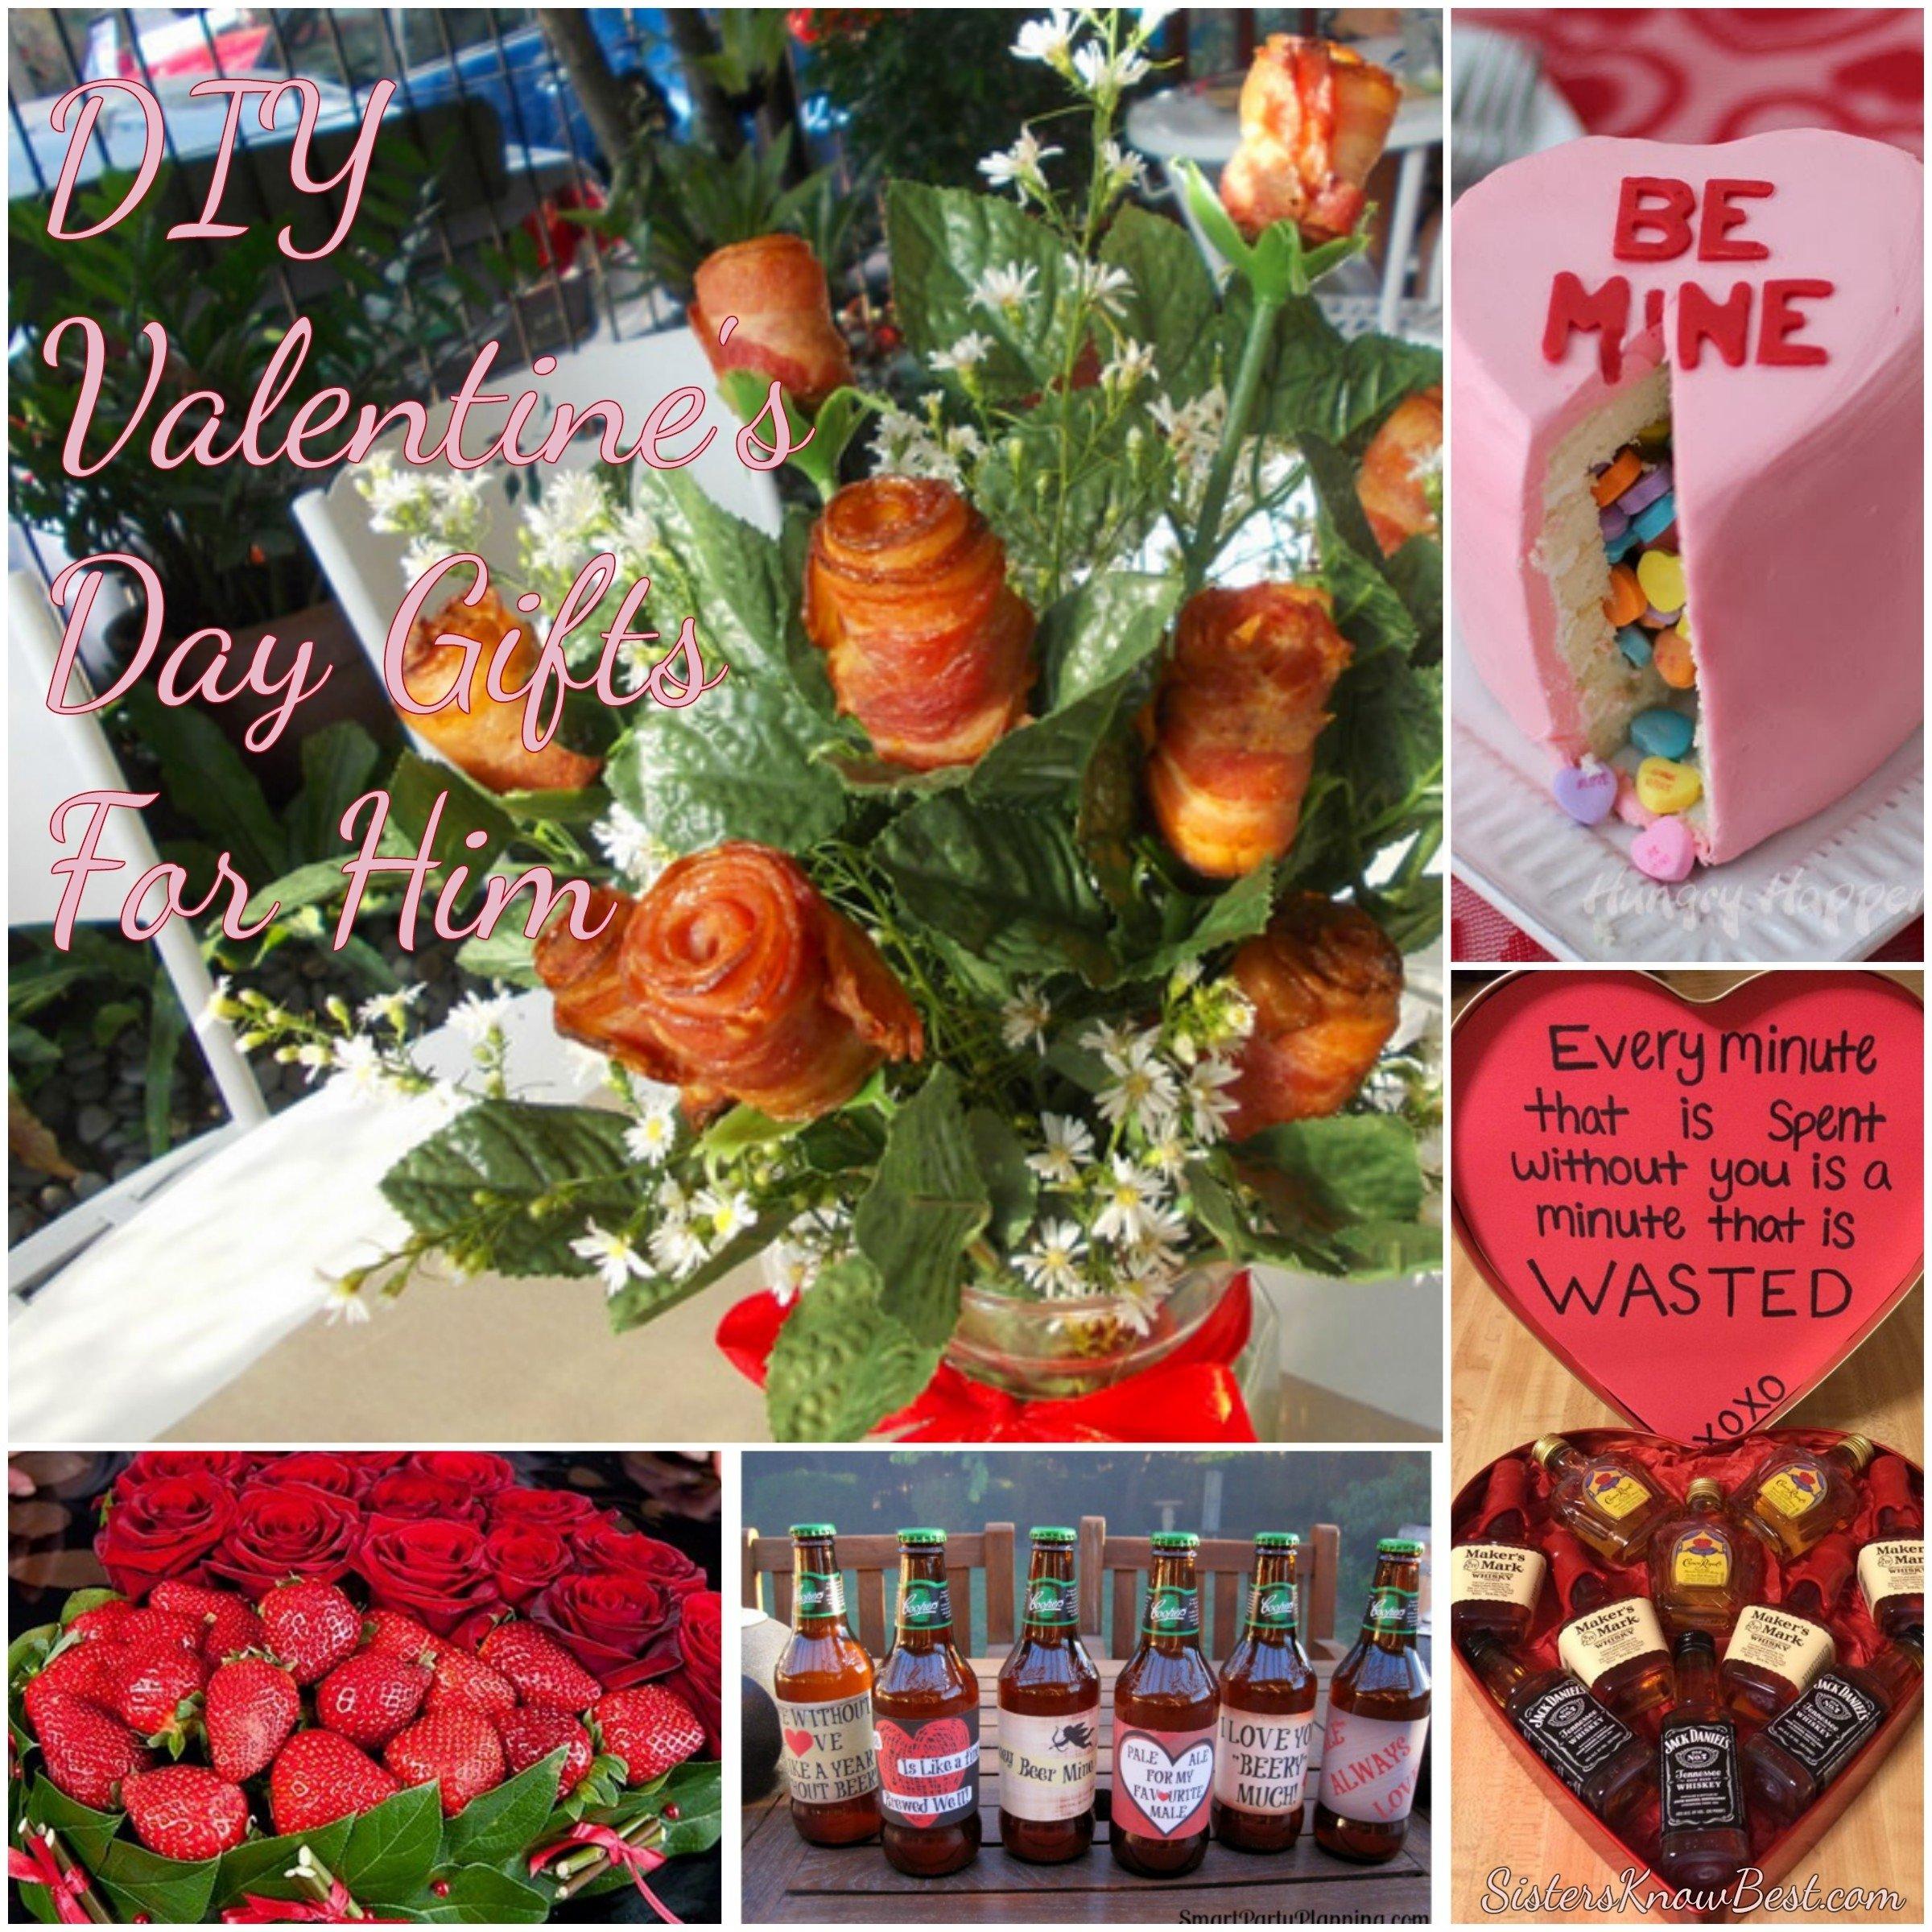 10 Attractive Valentine Day Gift Ideas For Men top 5 diy valentines day gifts for men sisters know best 2020